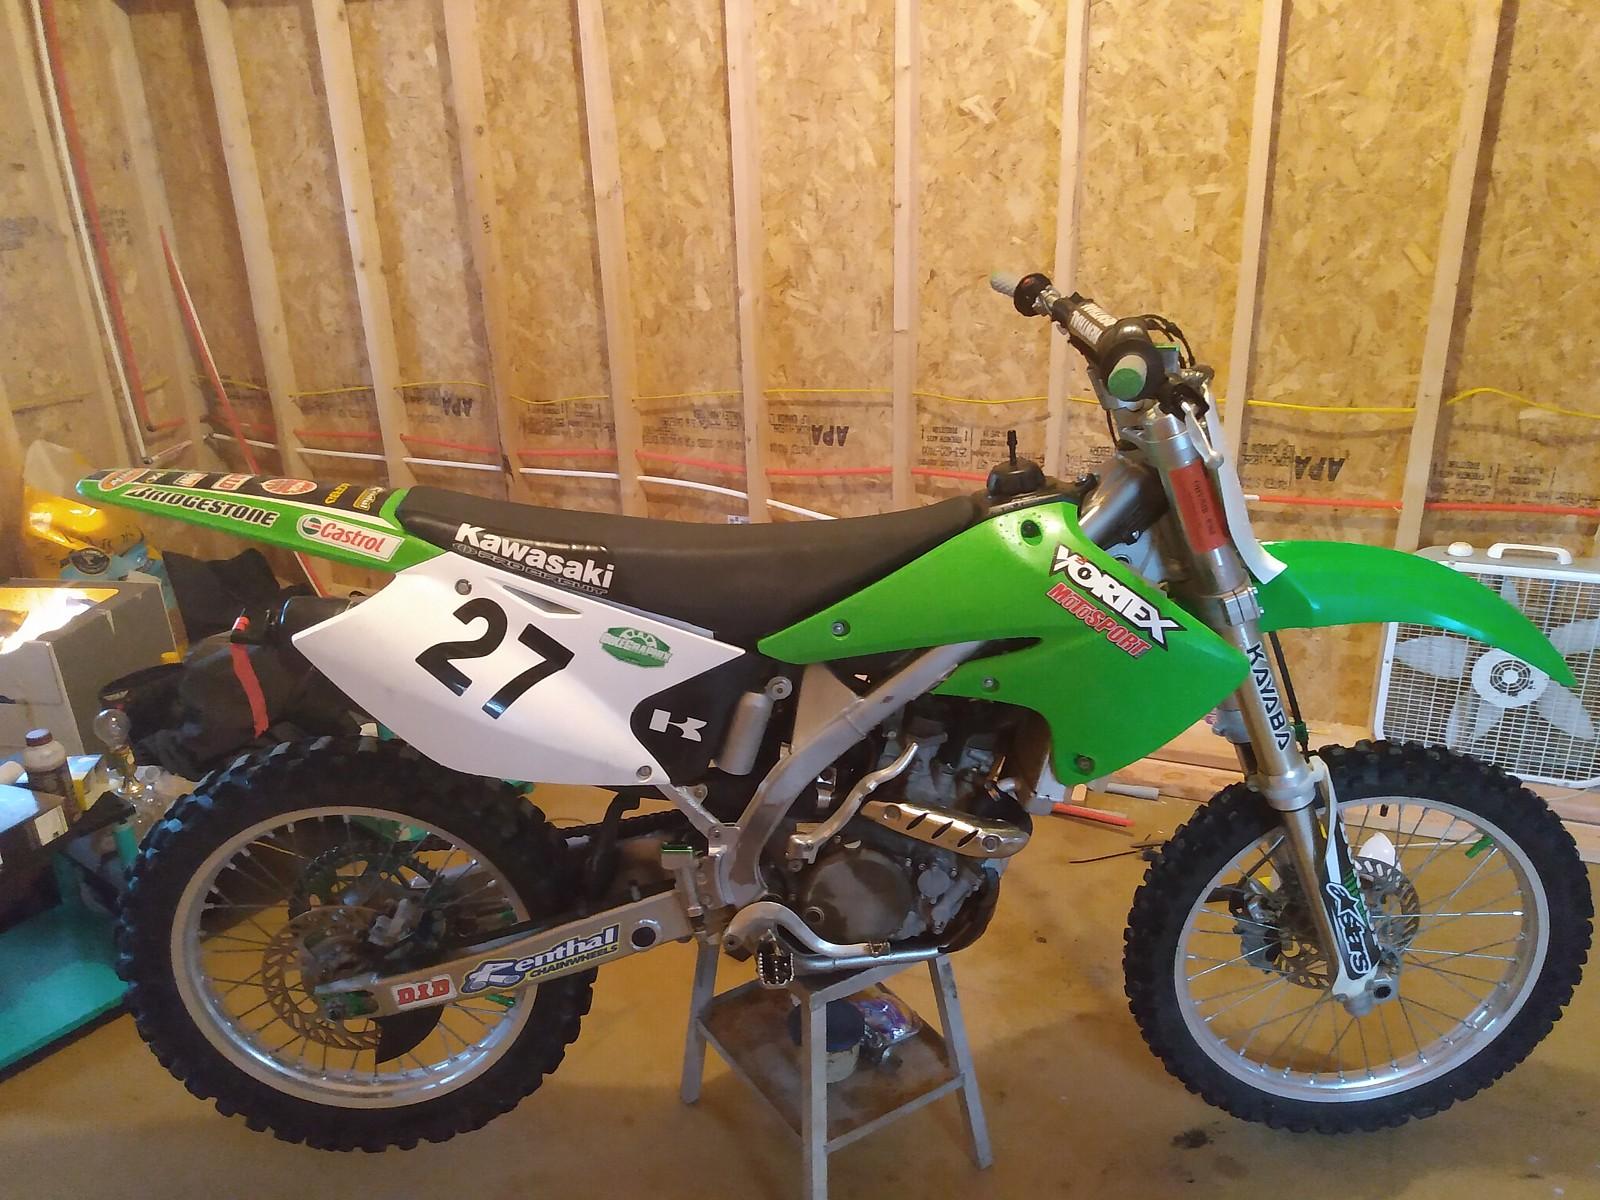 IMG 20200419 190403861 - kc0mqg - Motocross Pictures - Vital MX